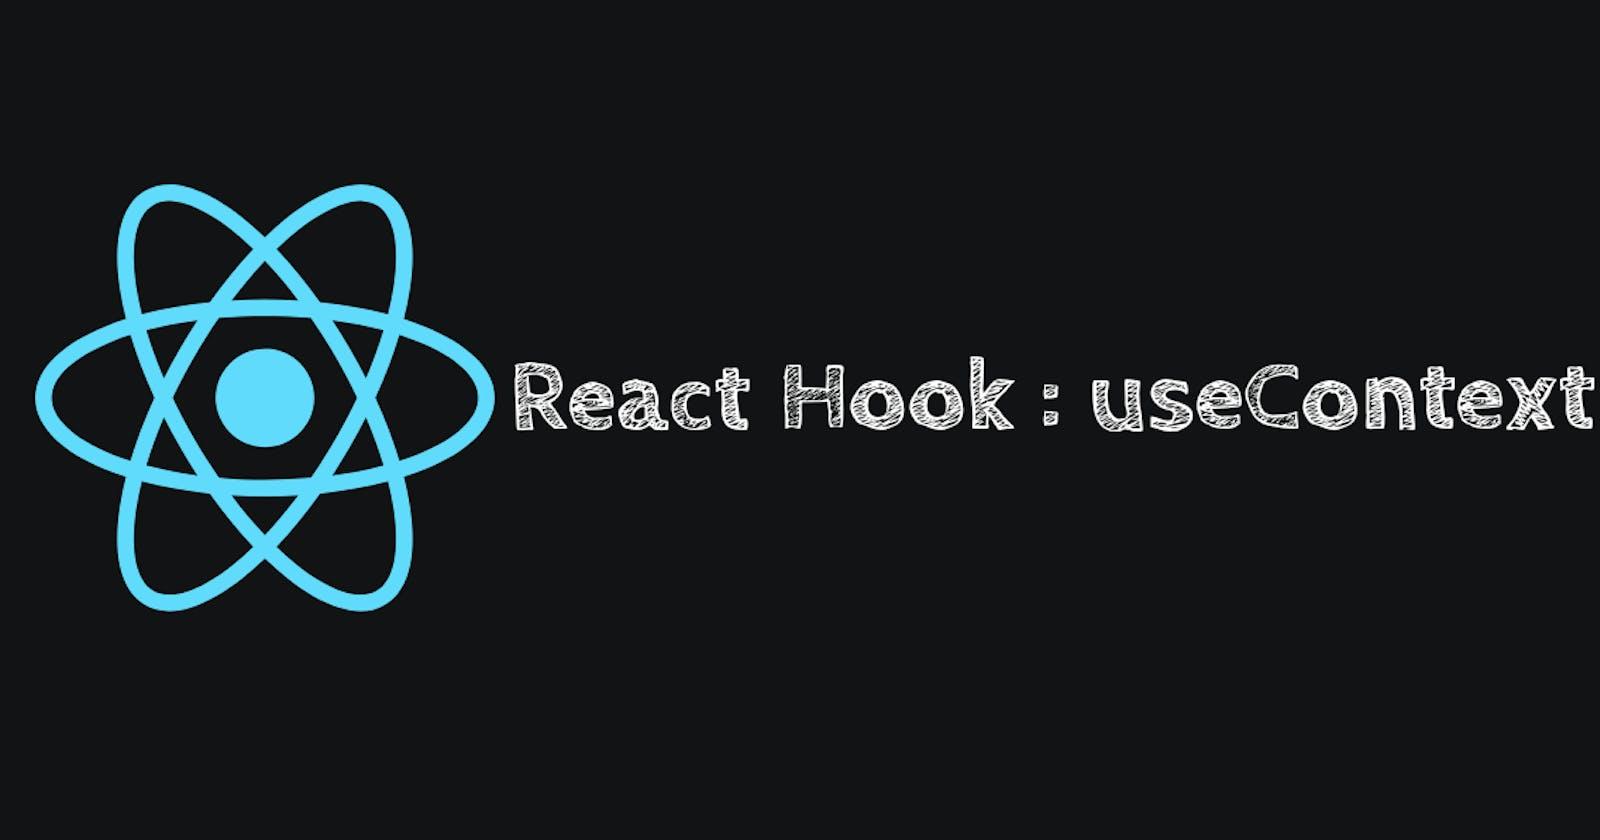 React Hook #5 useContext()